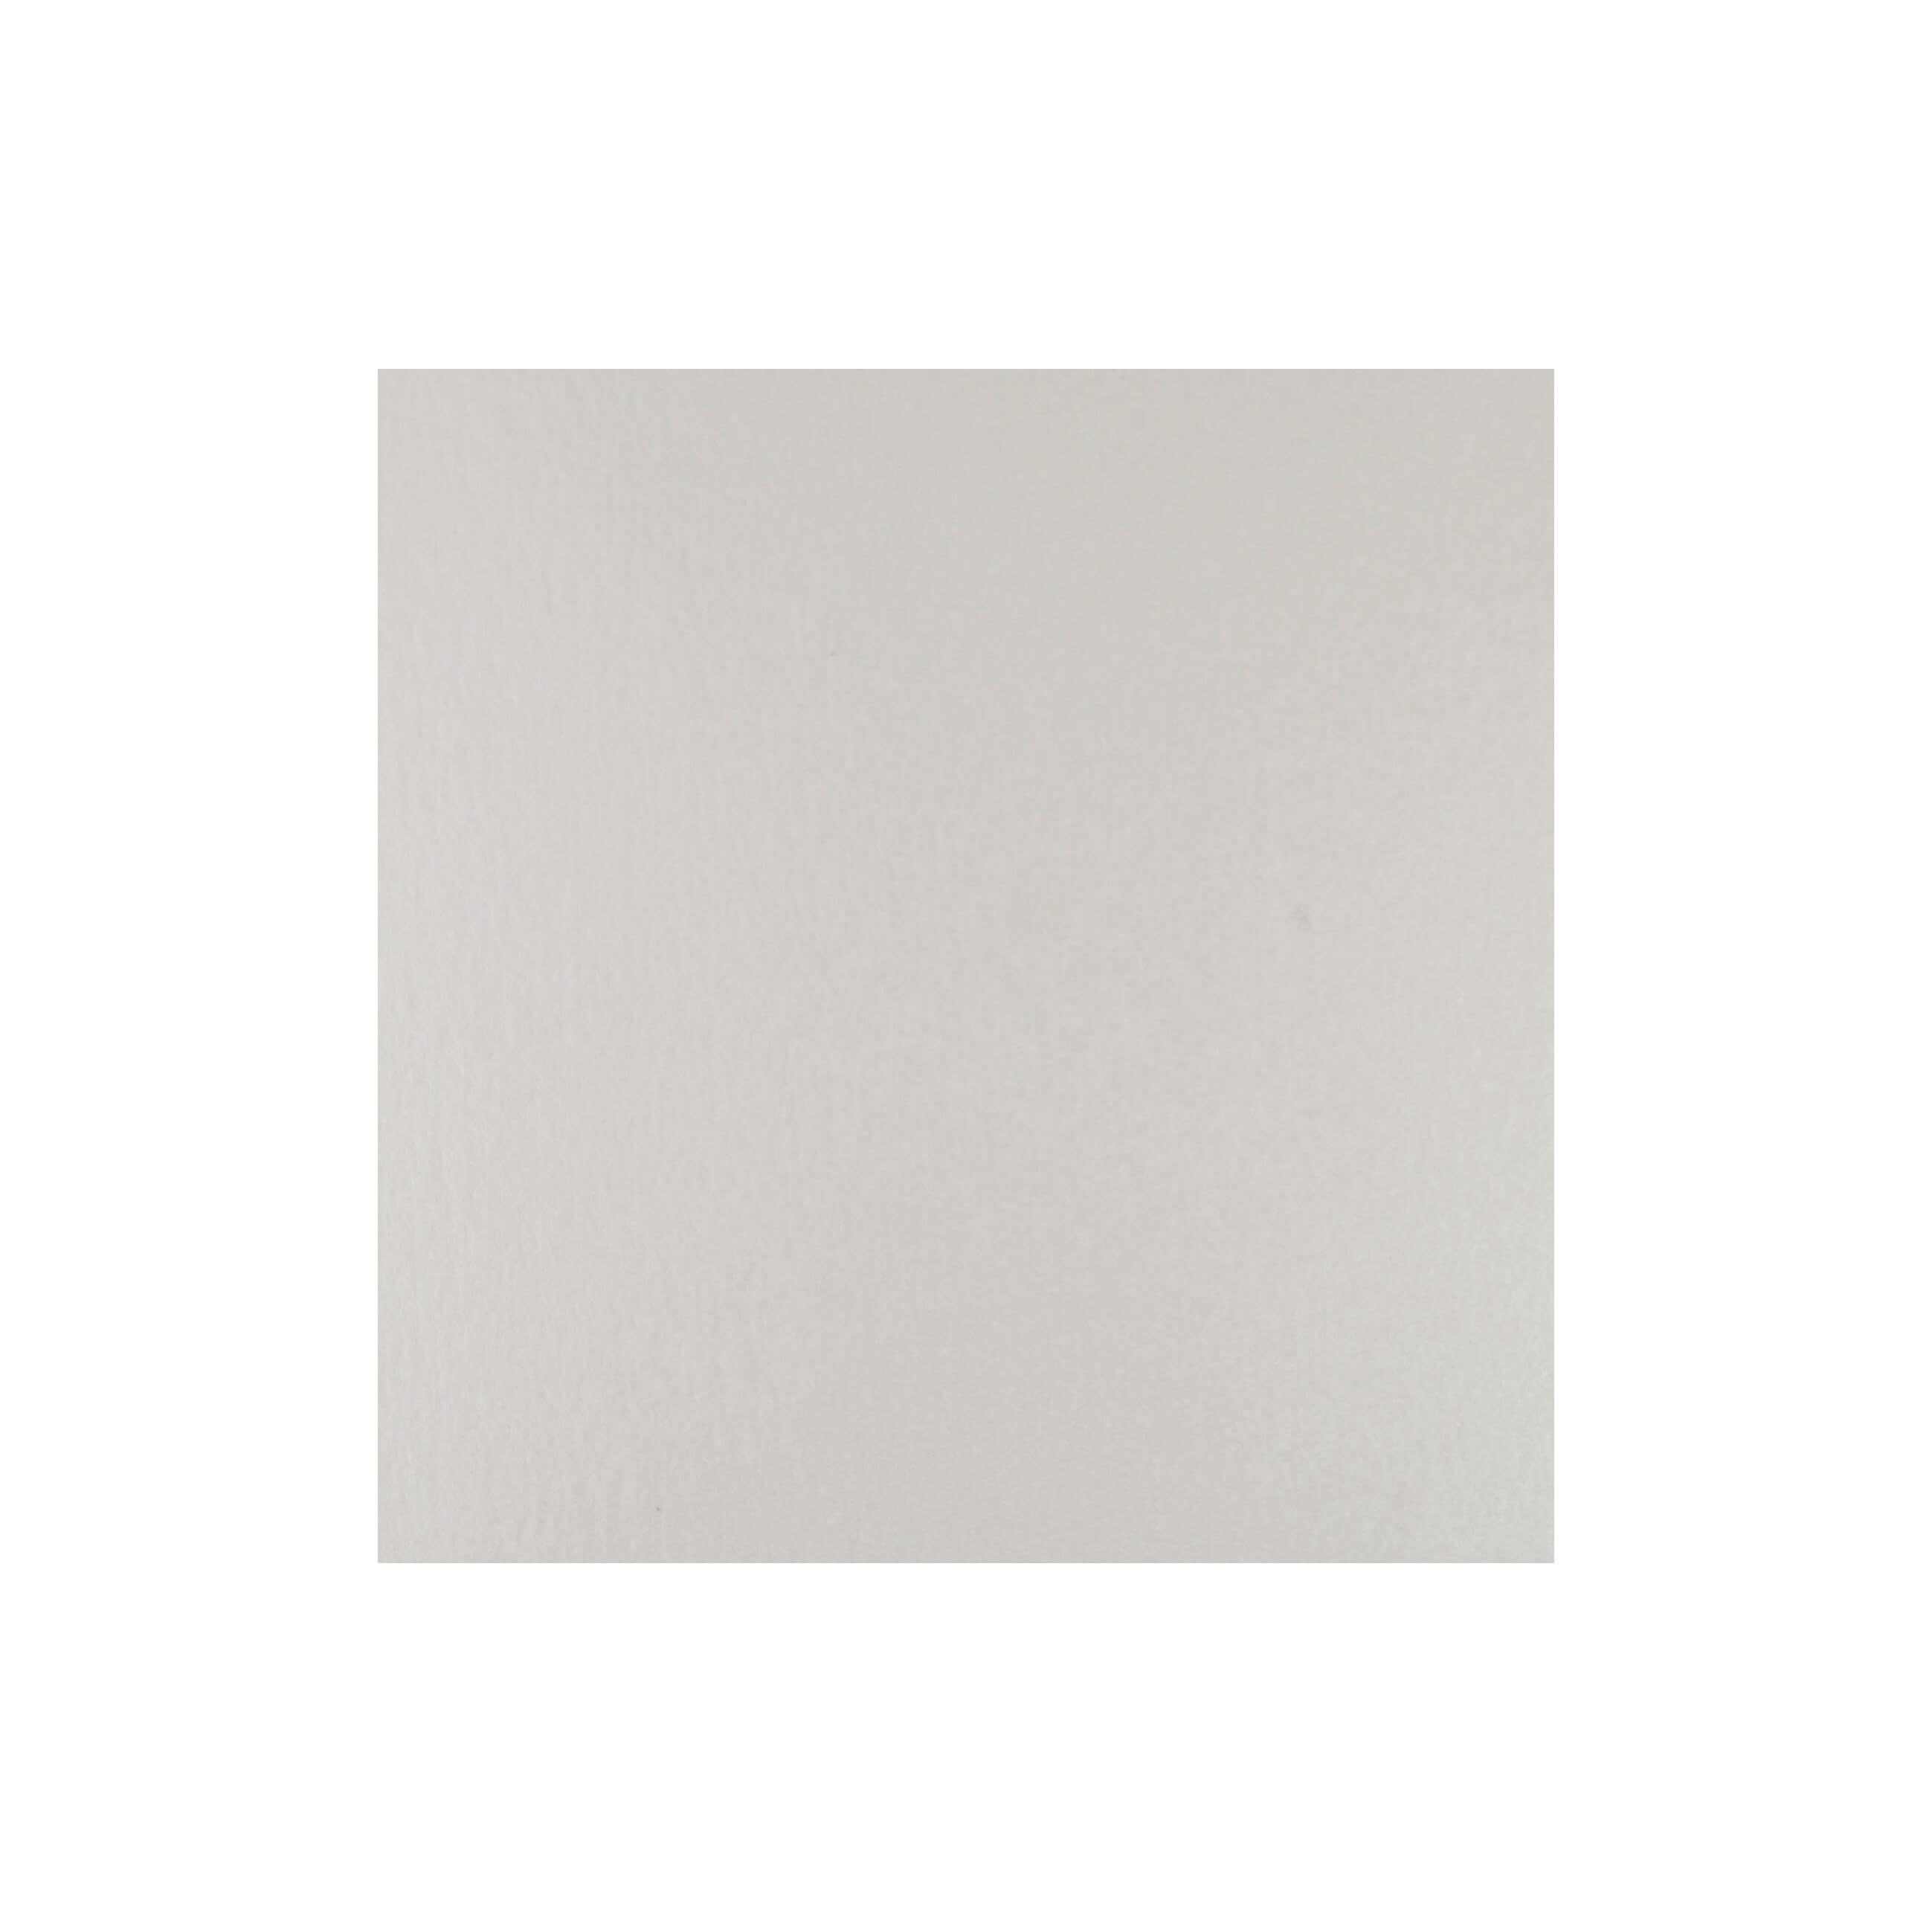 Enfolio Wallet 146mm Sq Cardpull Top - Soft Sheen Ivory